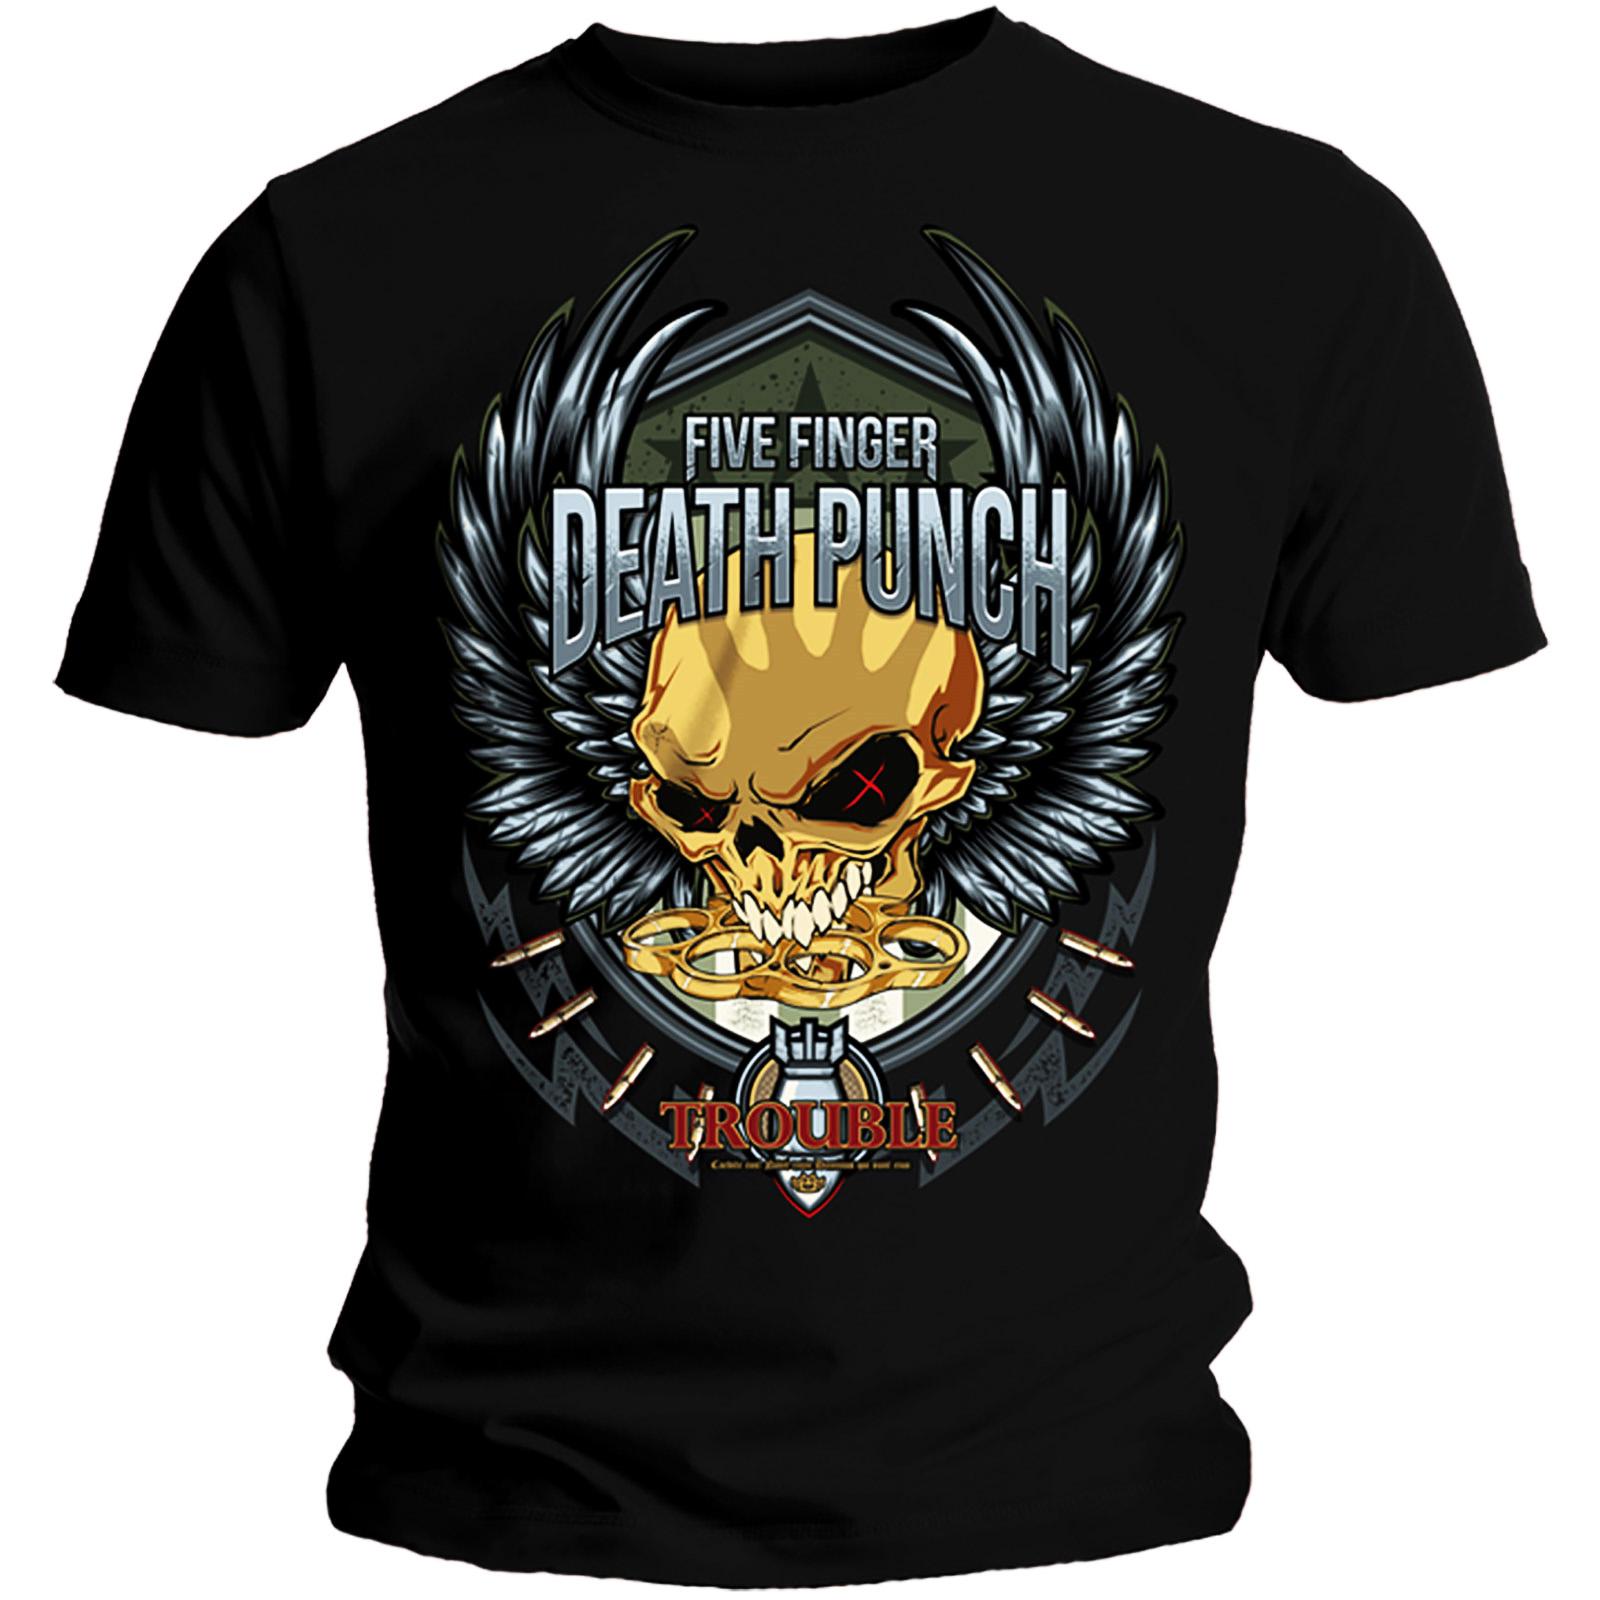 Official-T-Shirt-Five-Finger-Death-Punch-TROUBLE-Decade-of-Destruction-All-Sizes thumbnail 11